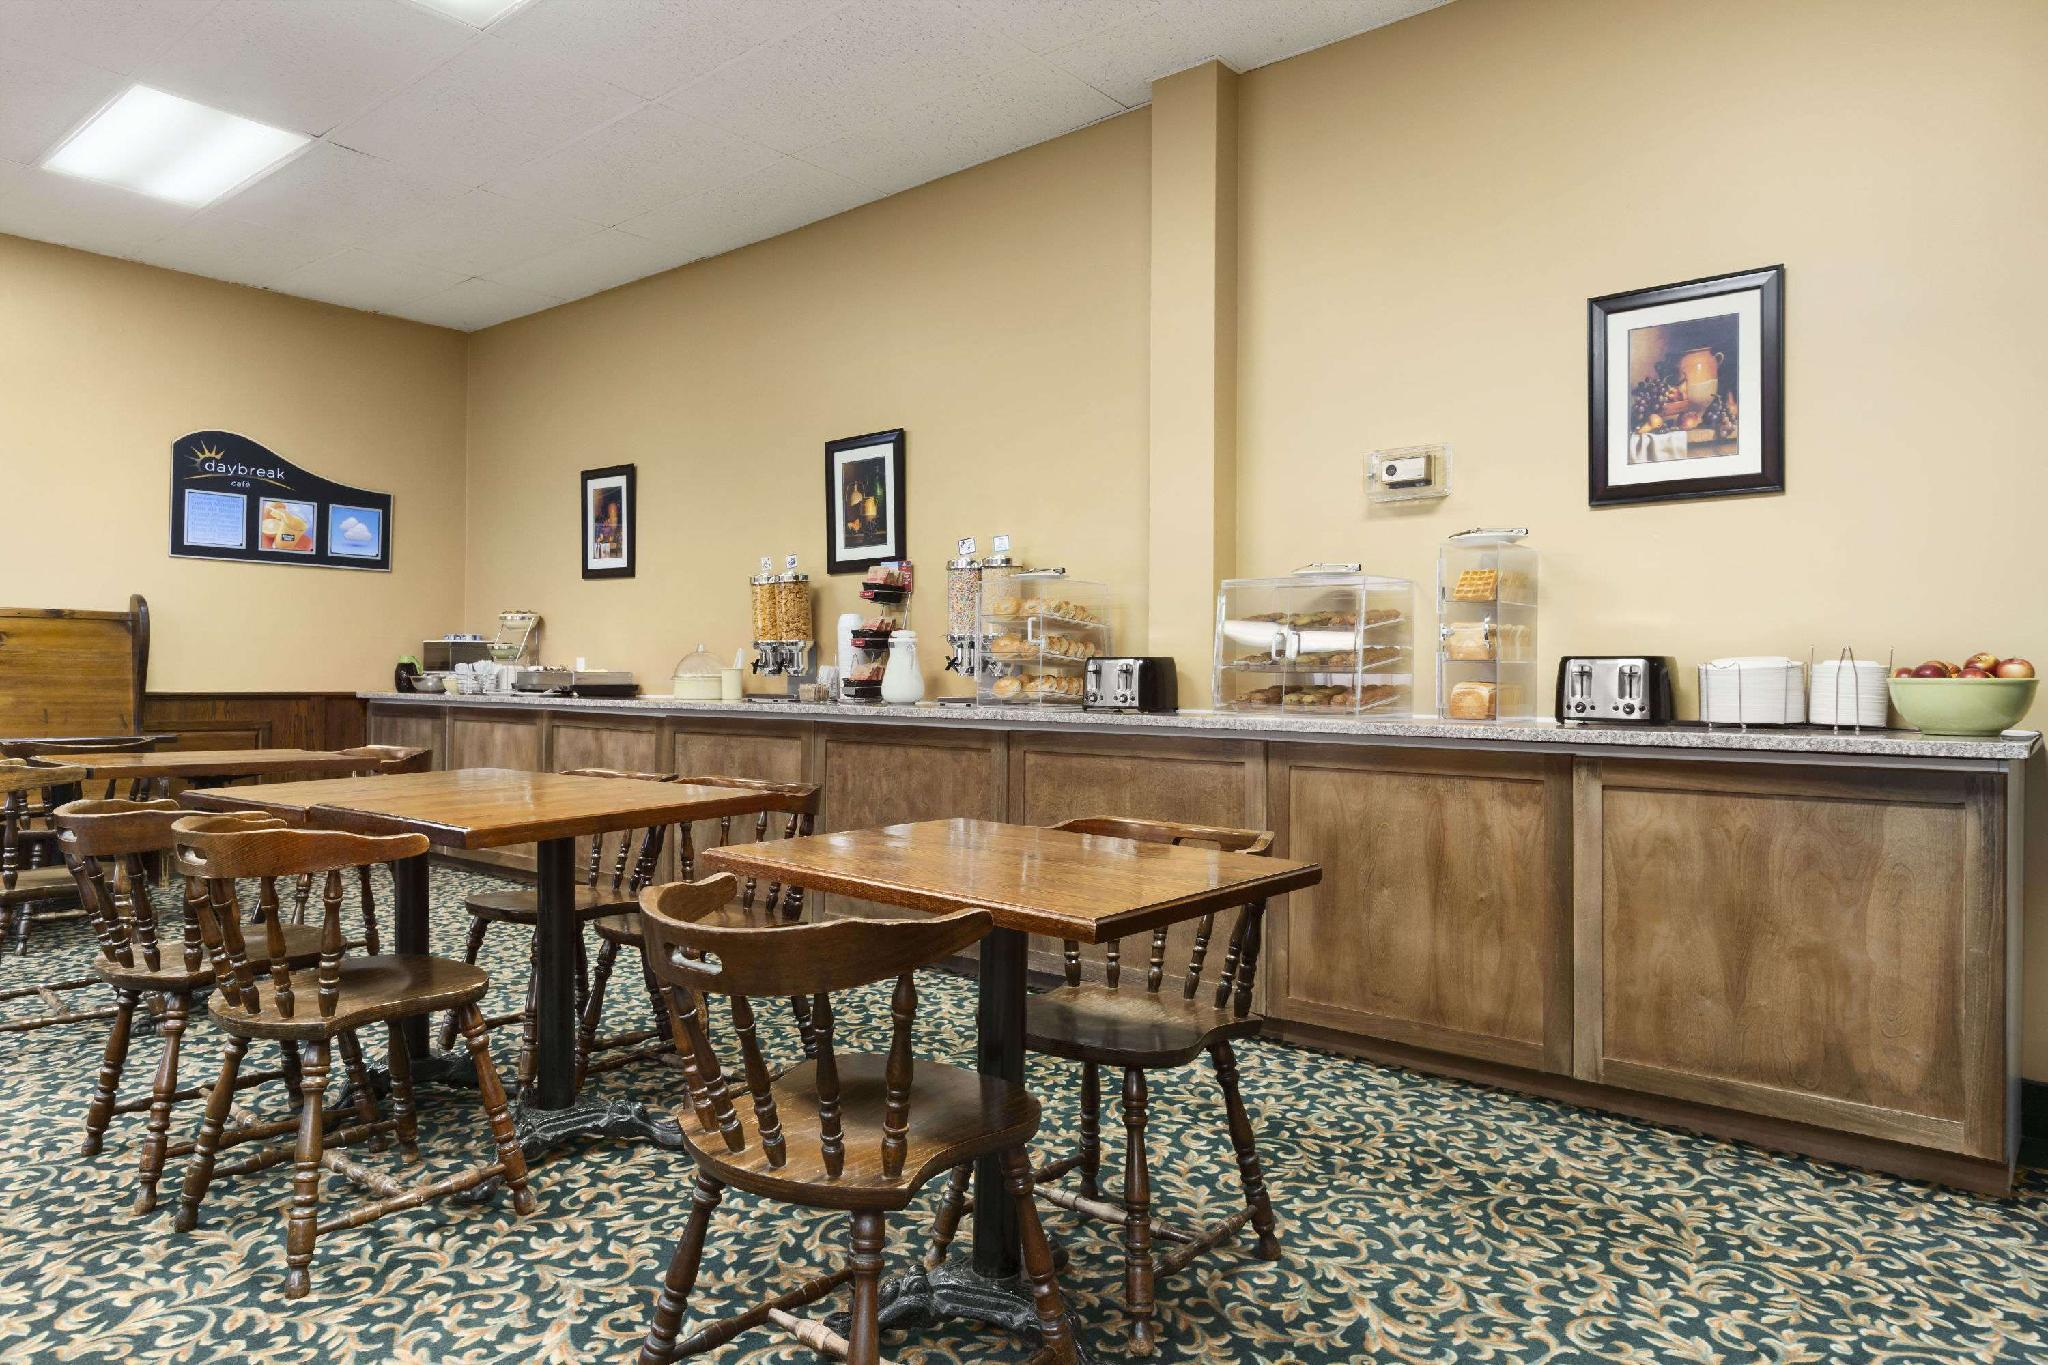 Days Inn by Wyndham Brockville, Leeds and Grenville